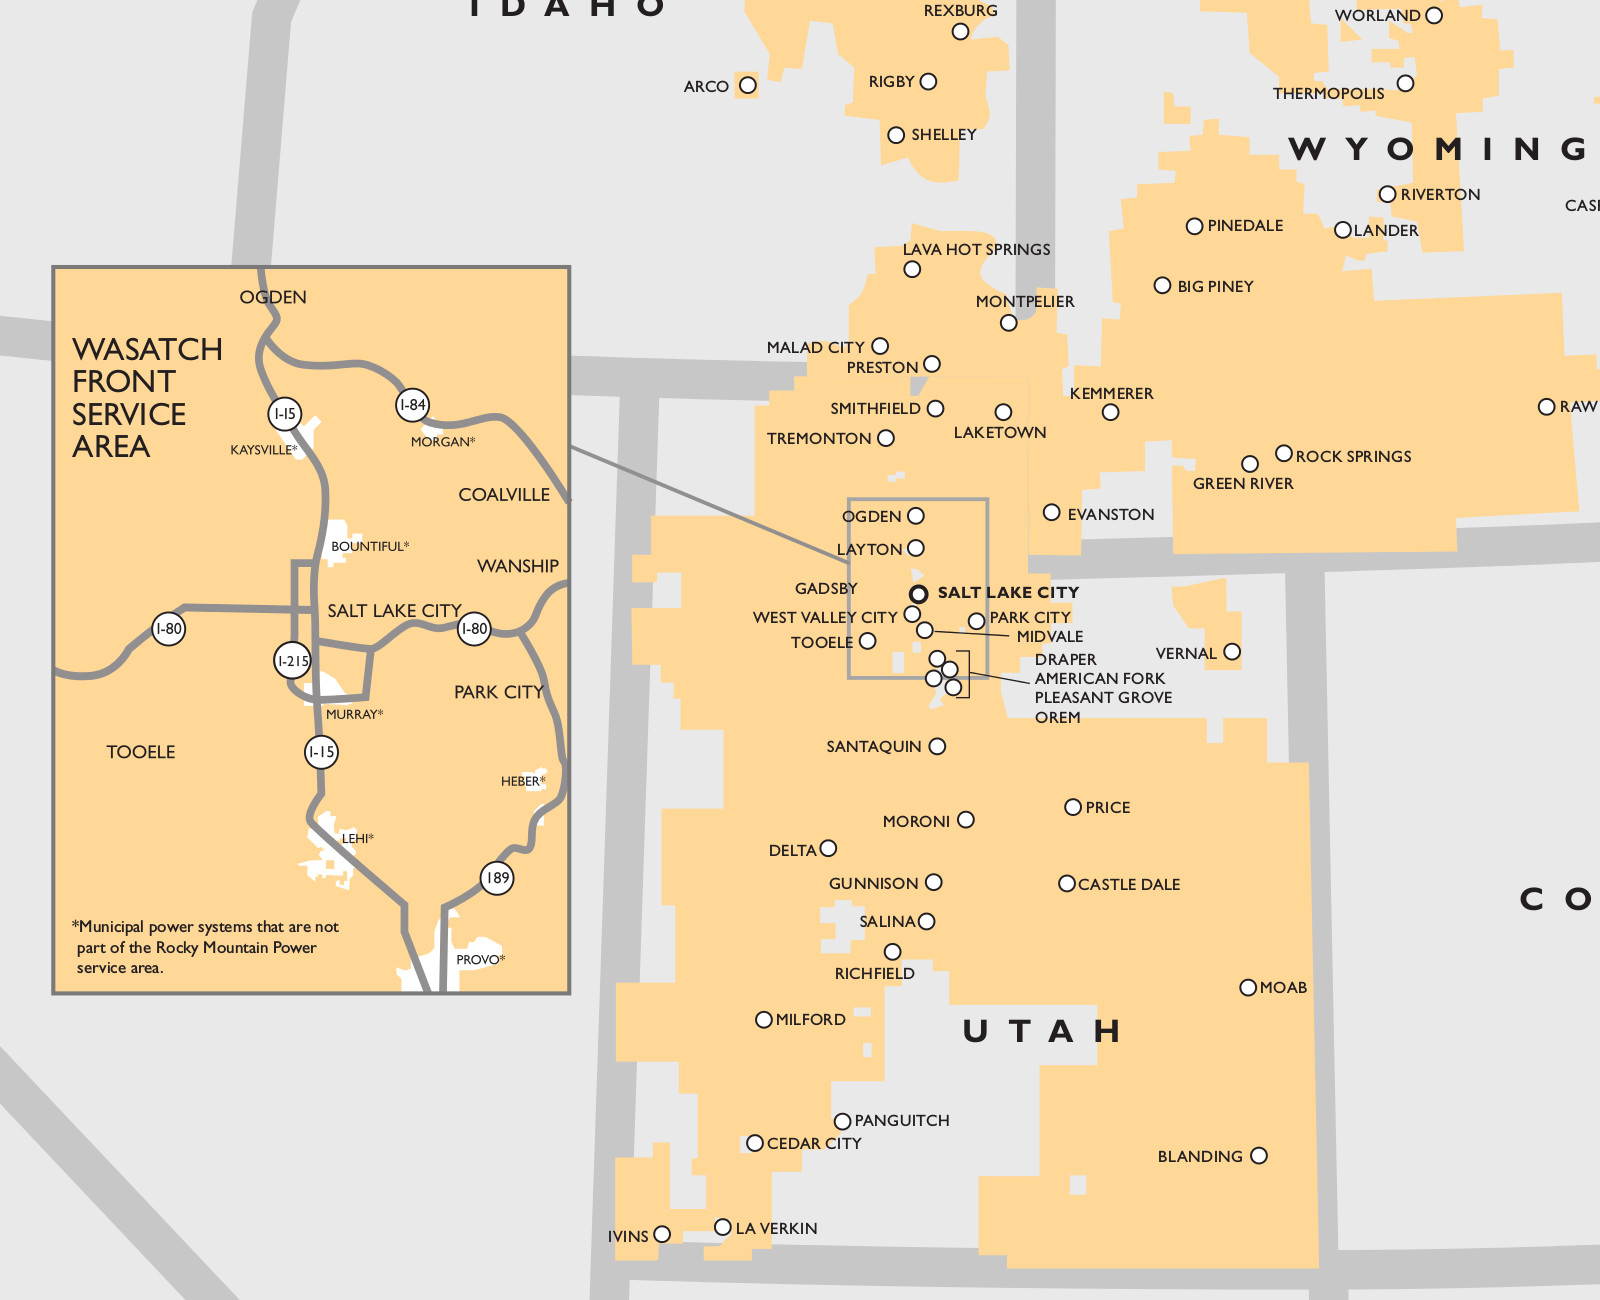 Rocky Mountain Power's Utah service area | Image courtesy of Rocky Mountain Power, St. George News